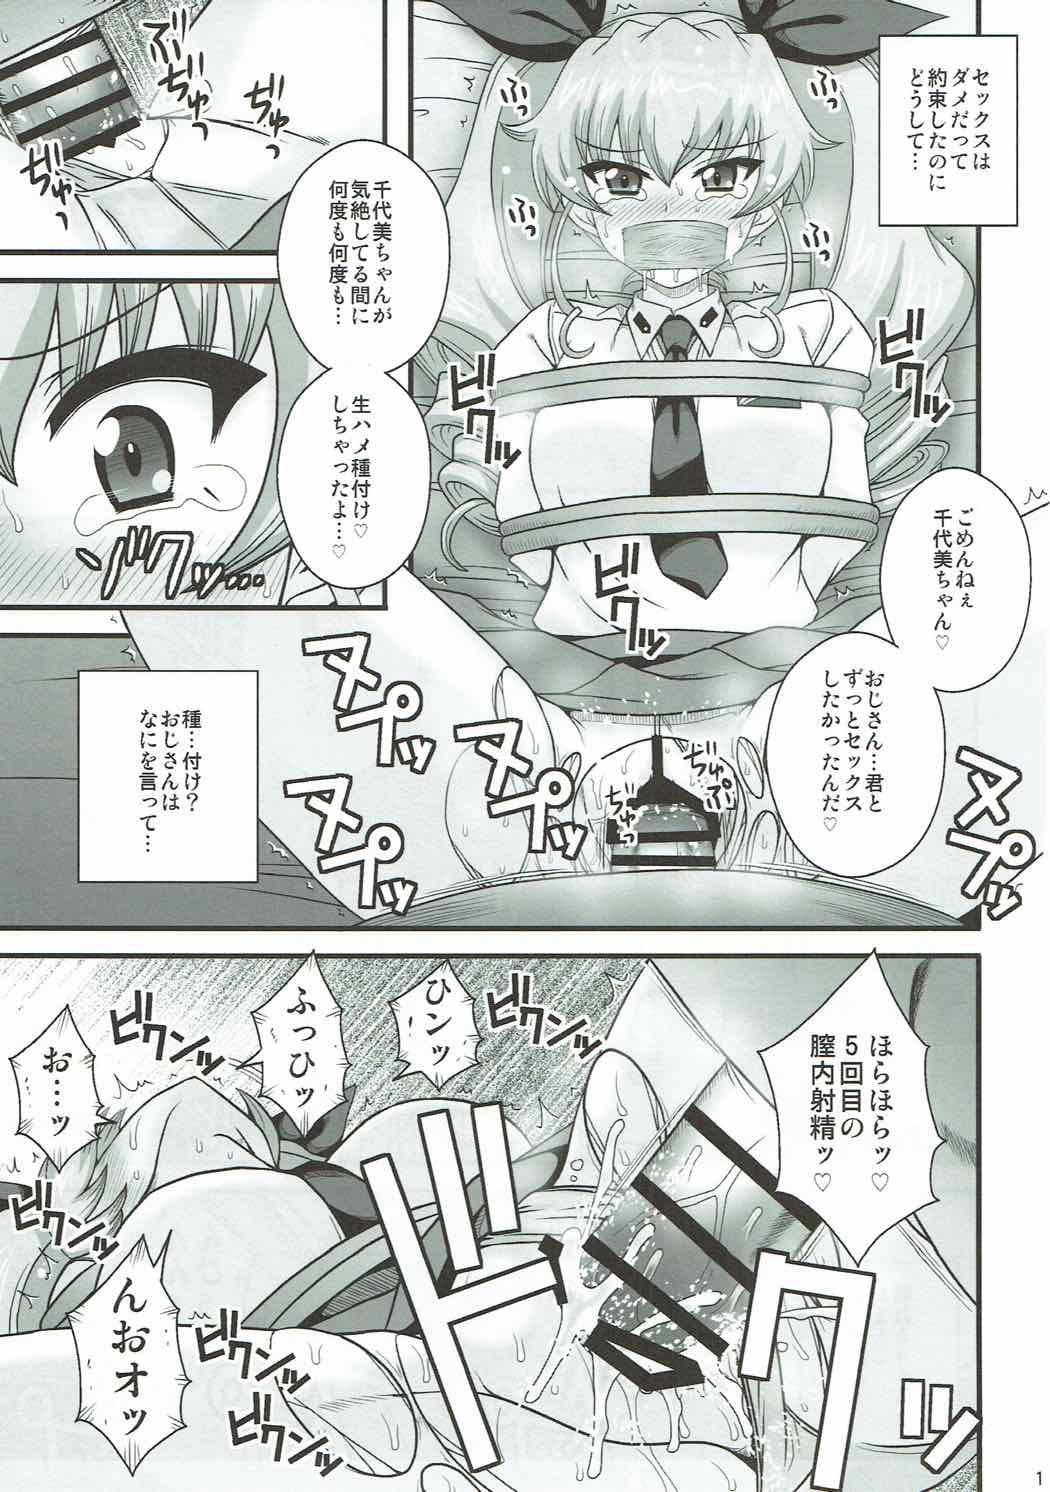 Anzio Enkou Chiyomi 17-sai 17